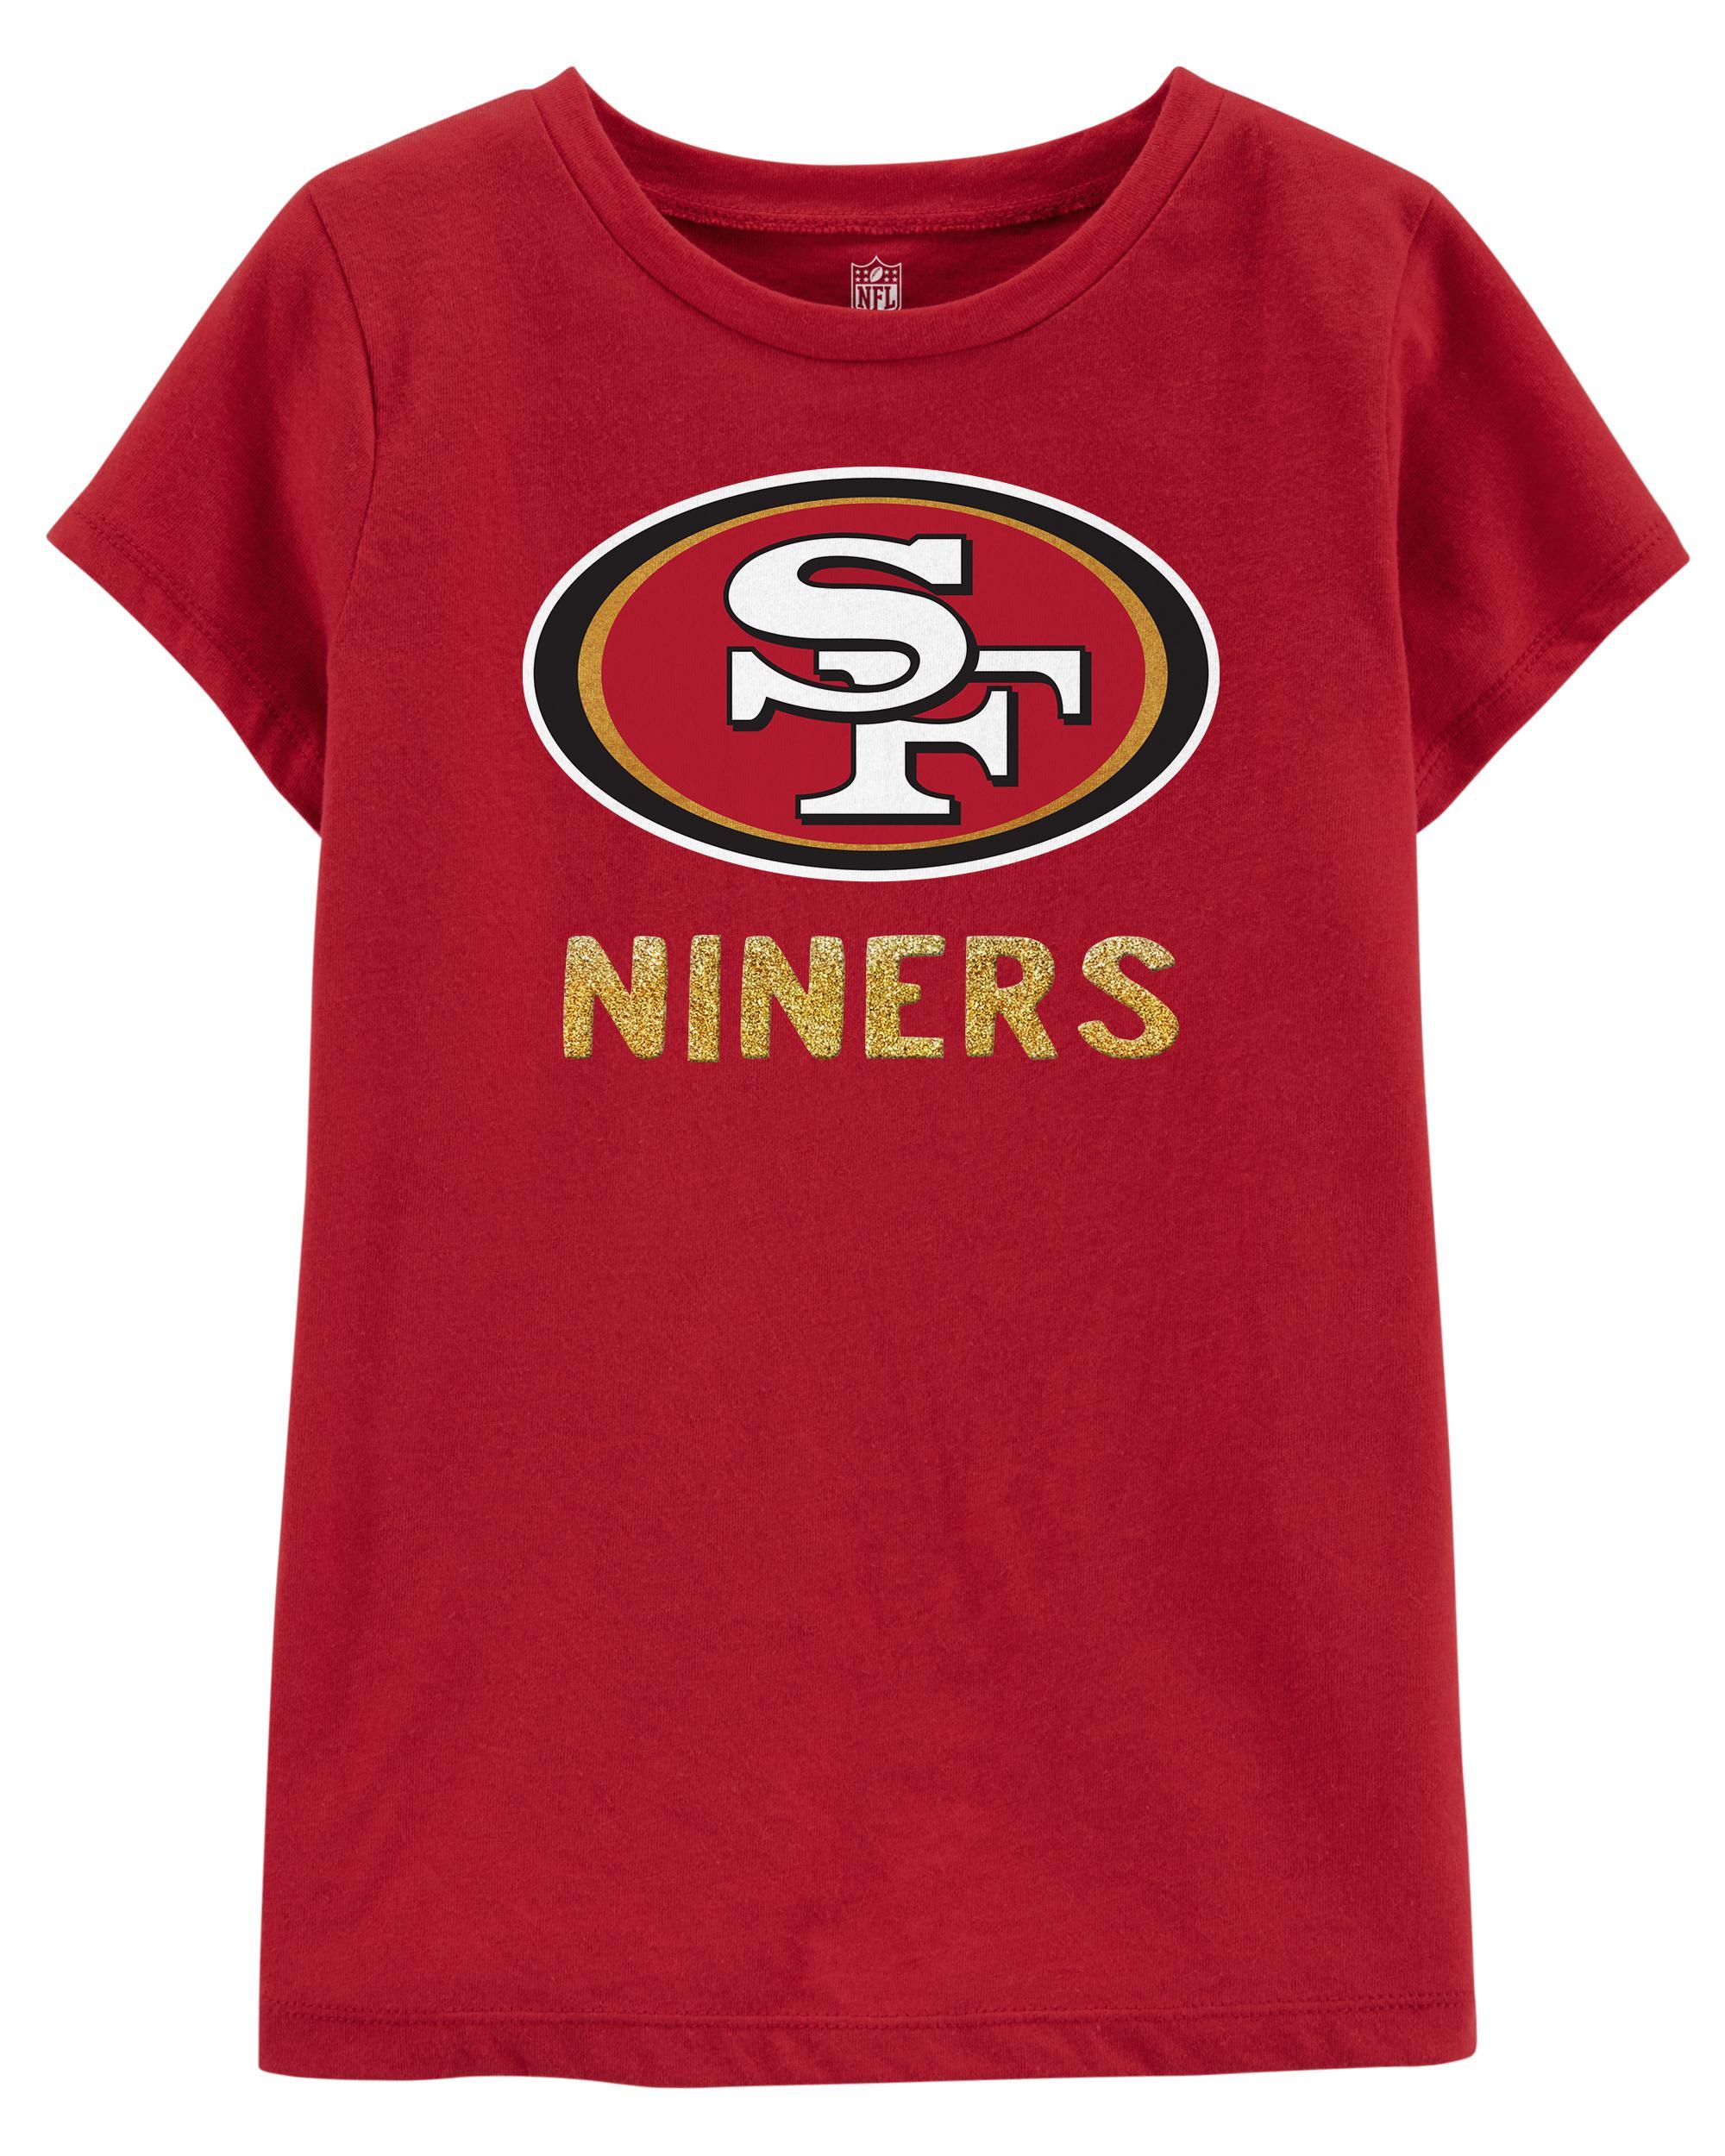 9f1cc742 NFL San Francisco 49ers Glitter Tee | carters.com